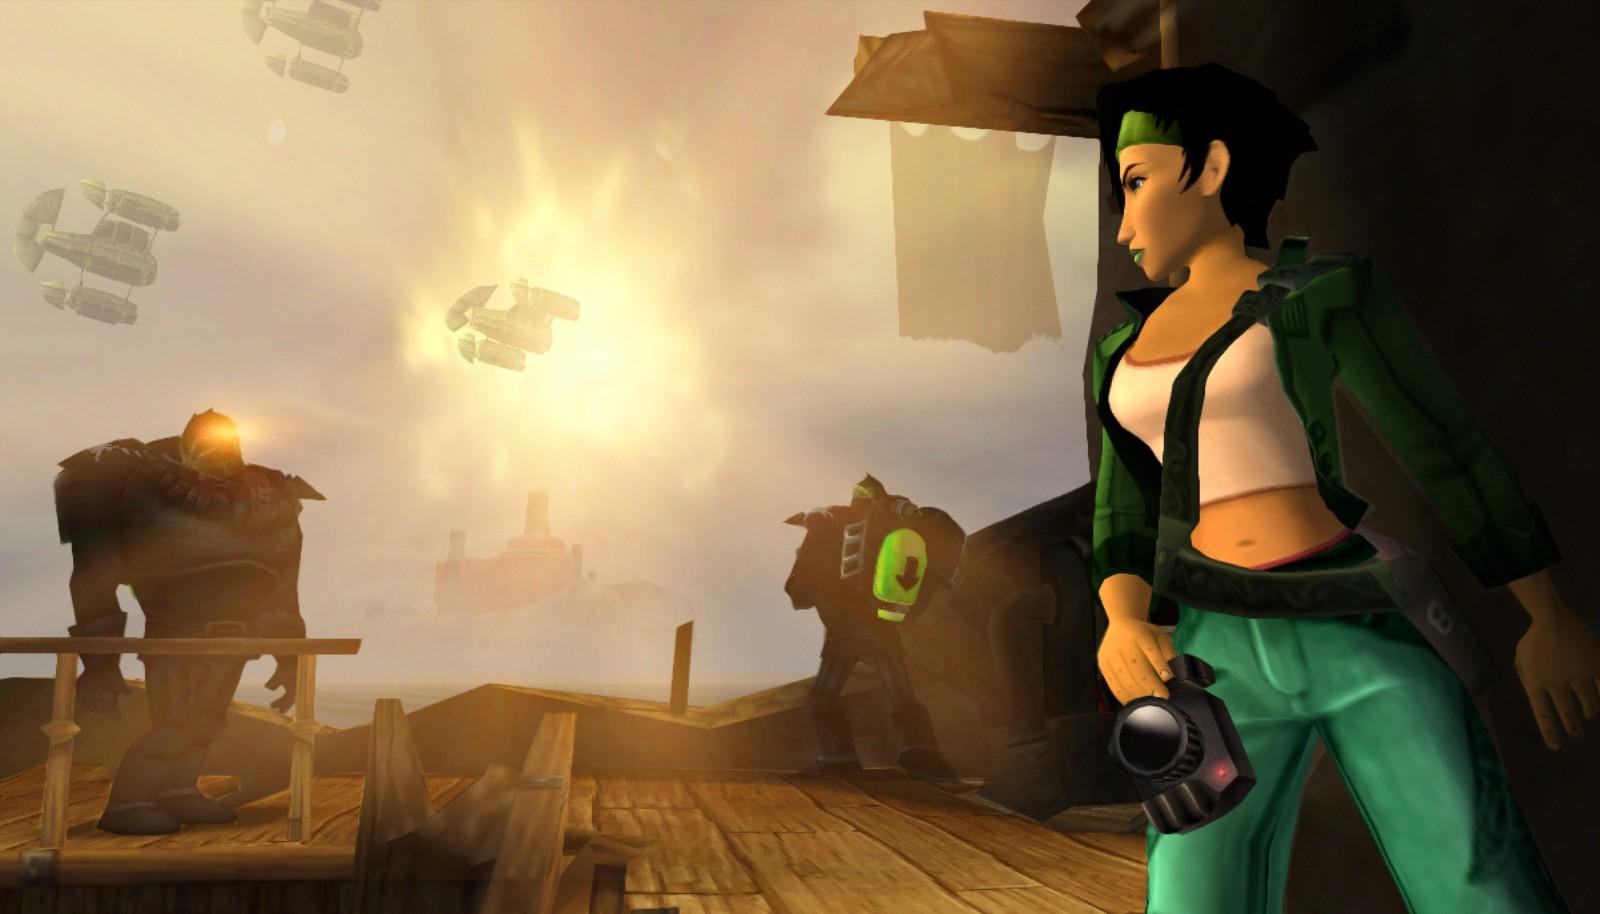 jade beyond good and evil